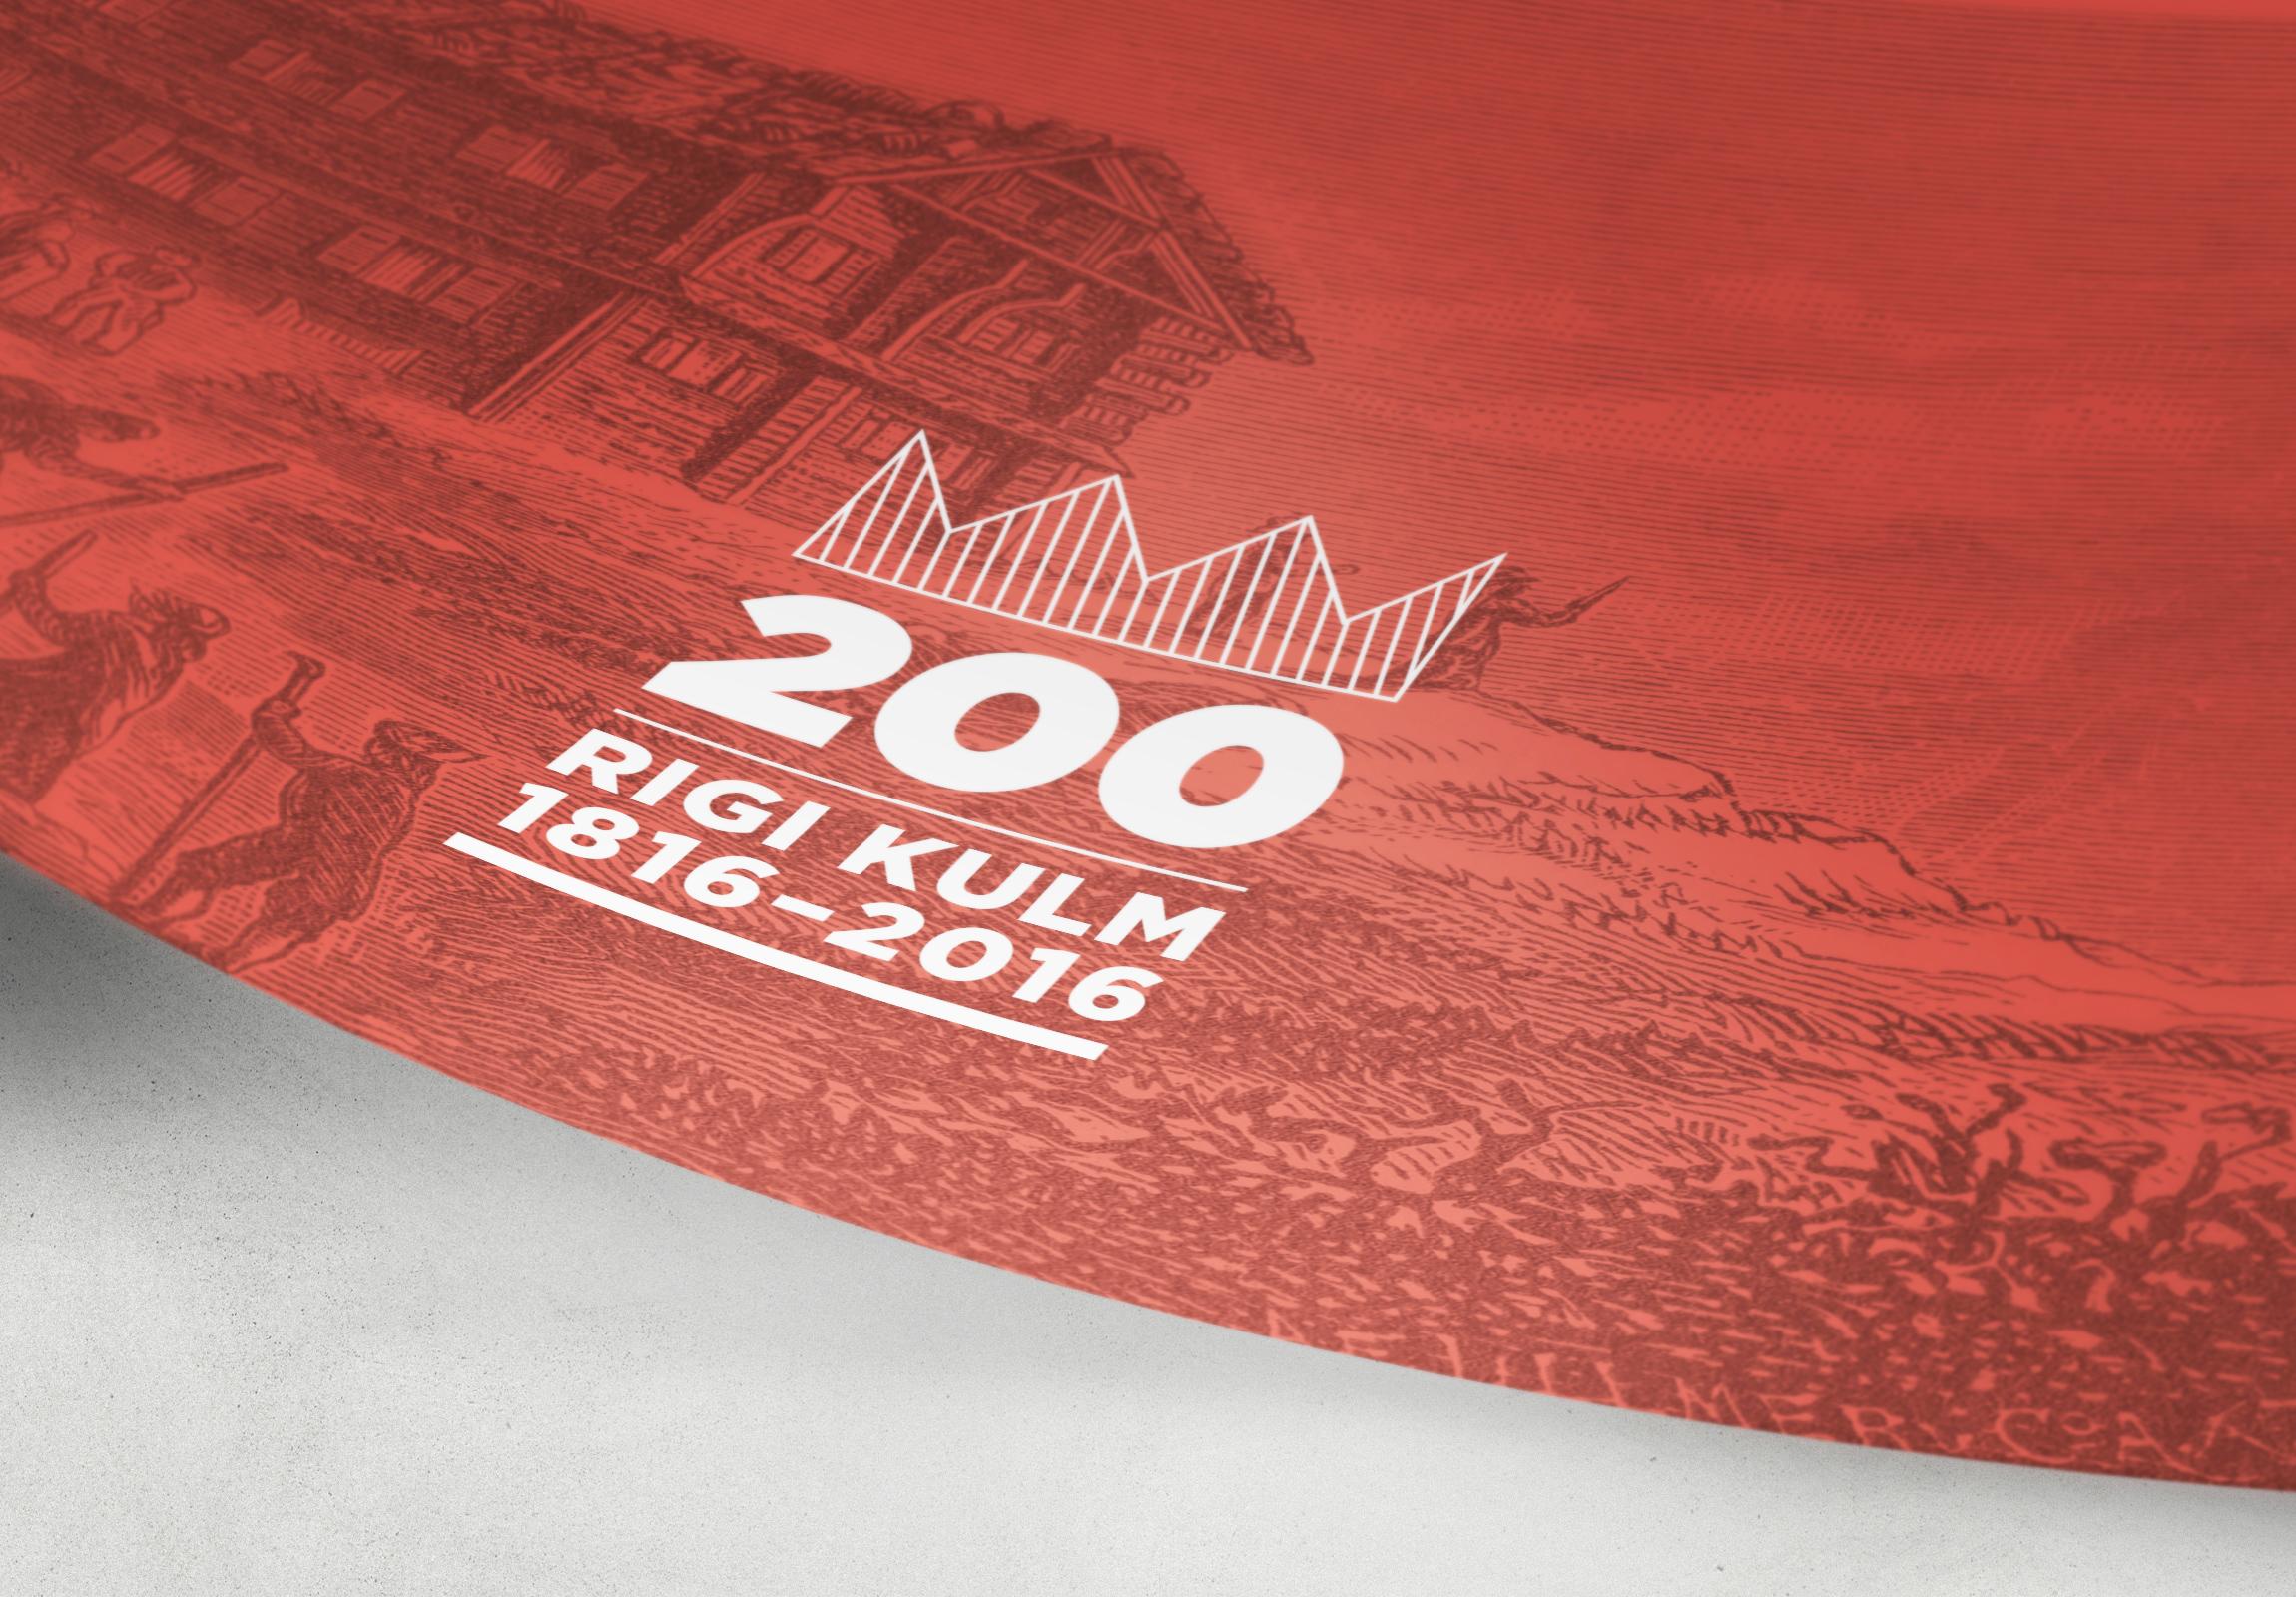 Rigi Kulm Hotel Jubiläum Grafik by Werbeagentur Bern - Blitz & Donner